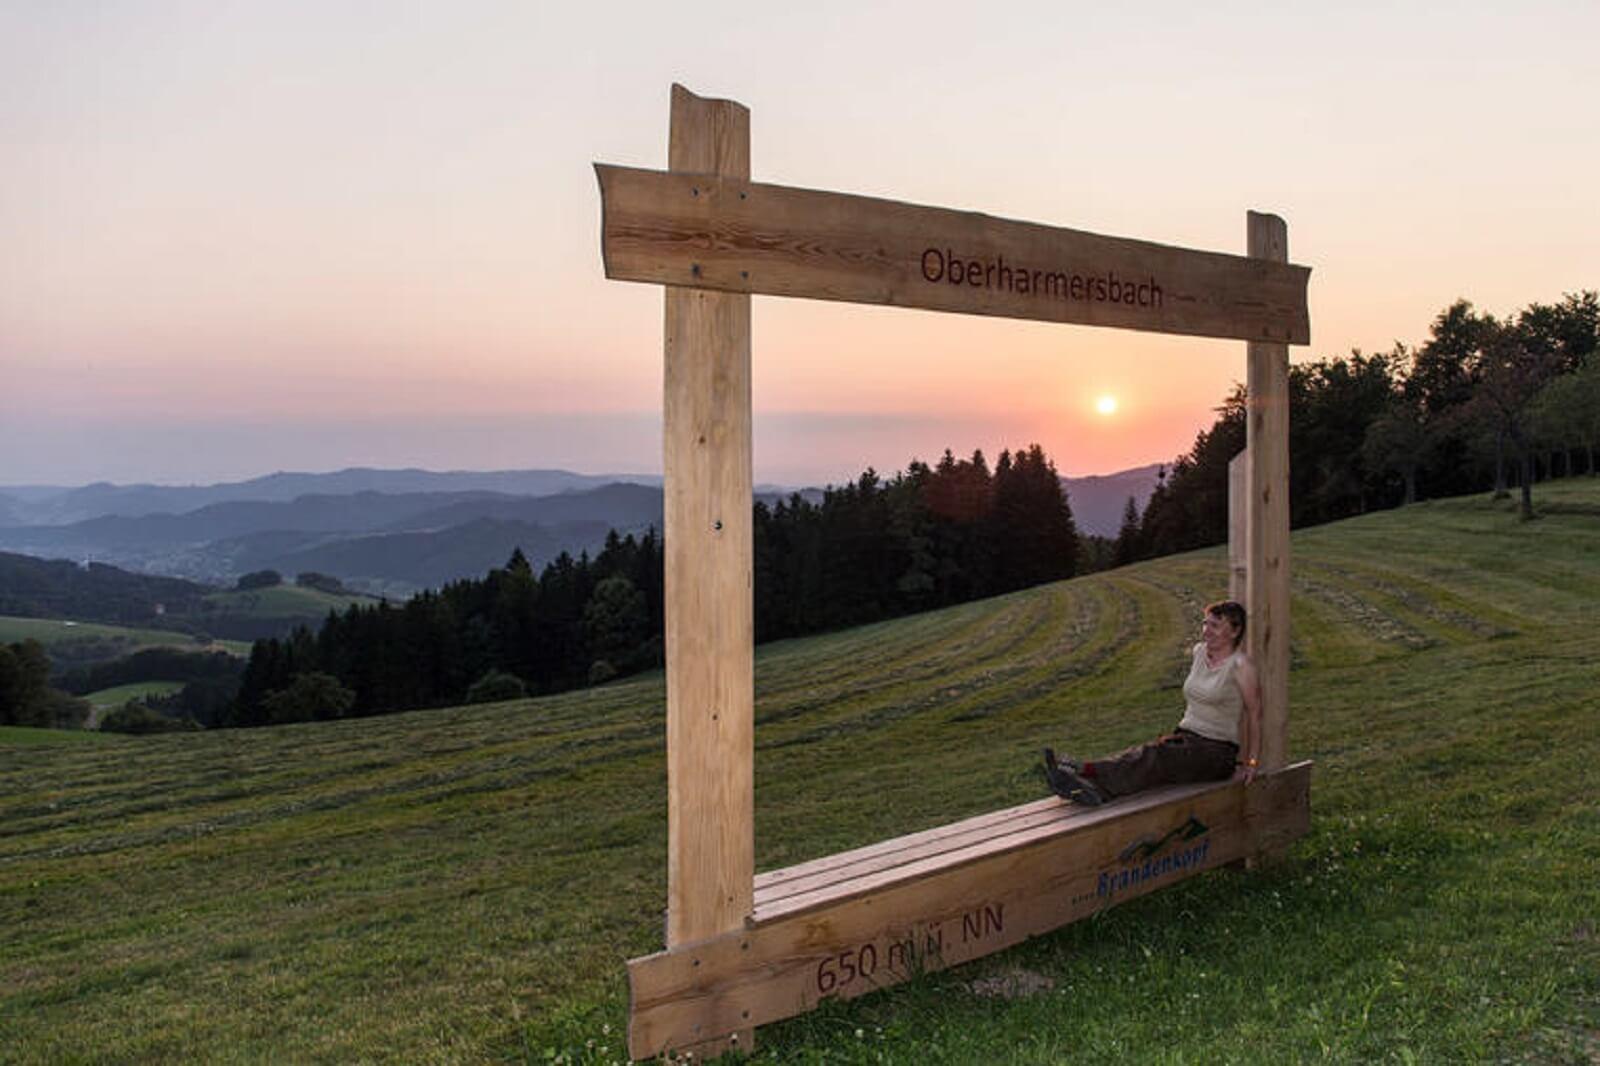 Angebot-Oberharmersbach